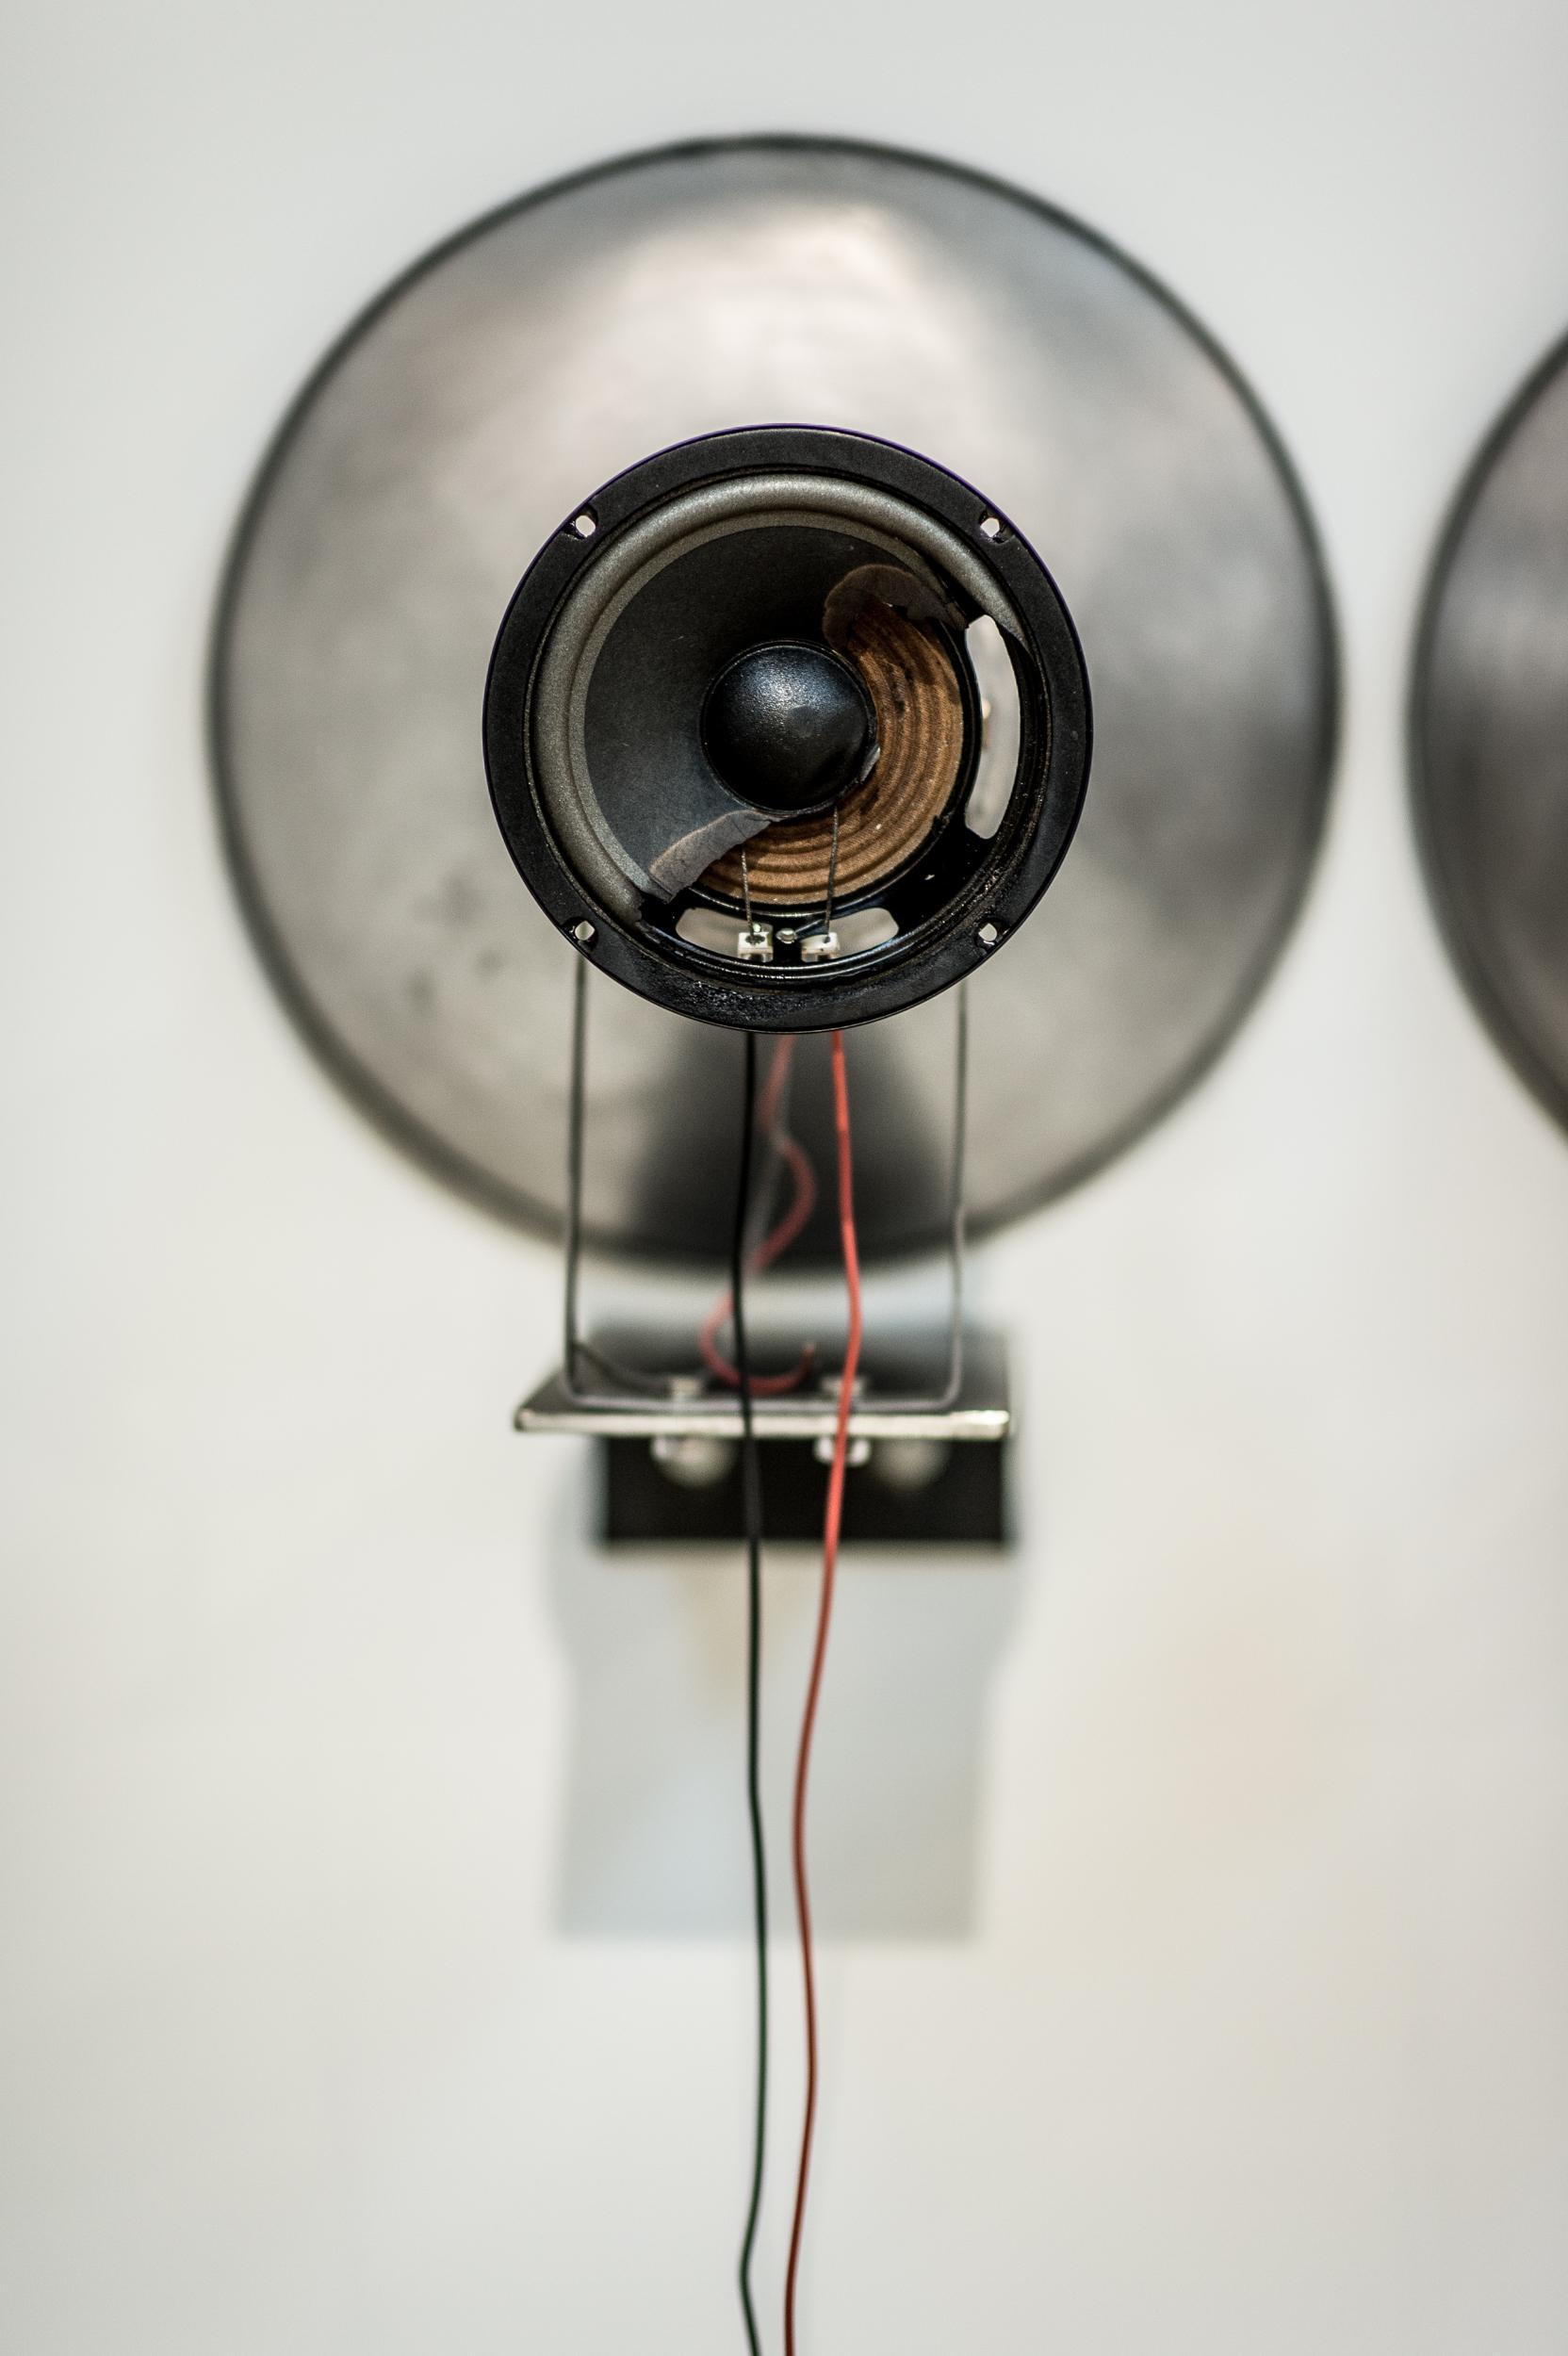 Arythmique,  2015.  [série Dialogues]   Installation avec mégaphones, haut-parleurs, battements de coeurs, amplificateur 40 watts, acier.   Installation with speakers, recorded heart beats, 40 watts amplifier and steel.   Dimensions variables   Variable dimensions